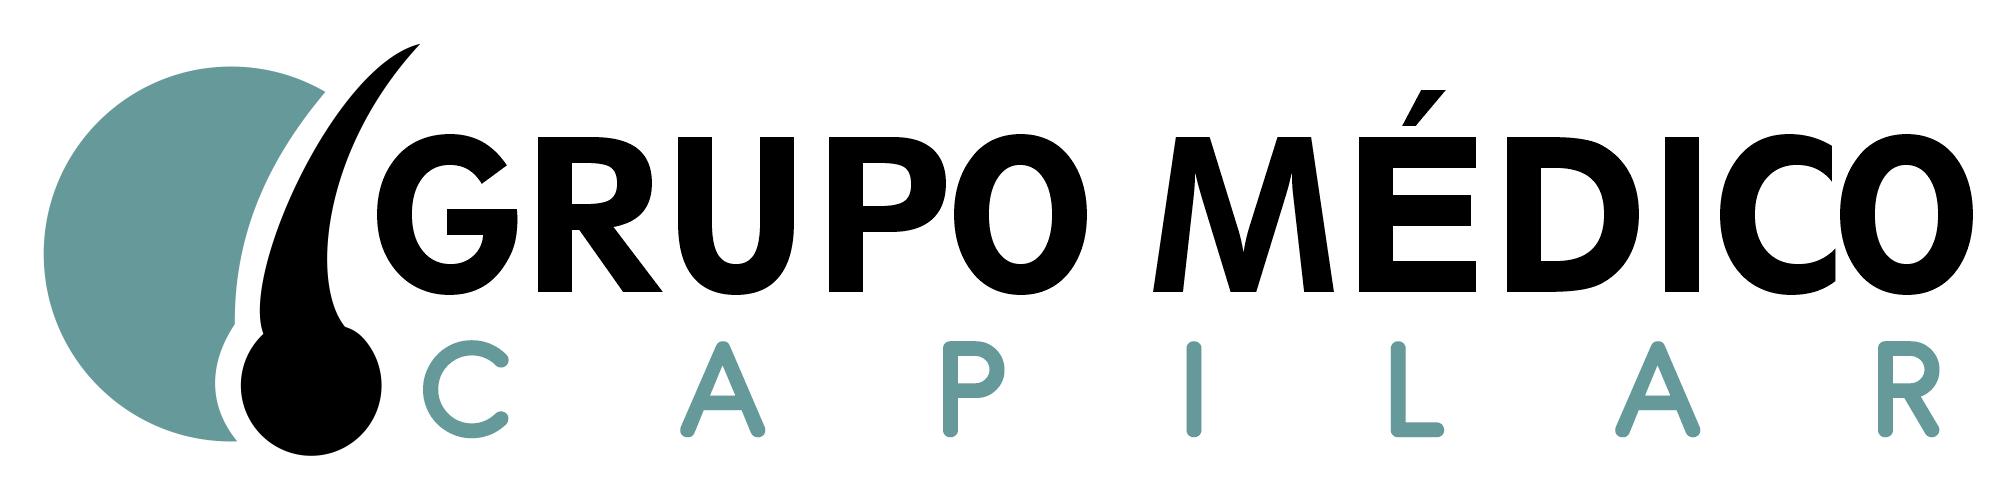 Grupo Médico Capilar - Injerto Capilar Madrid